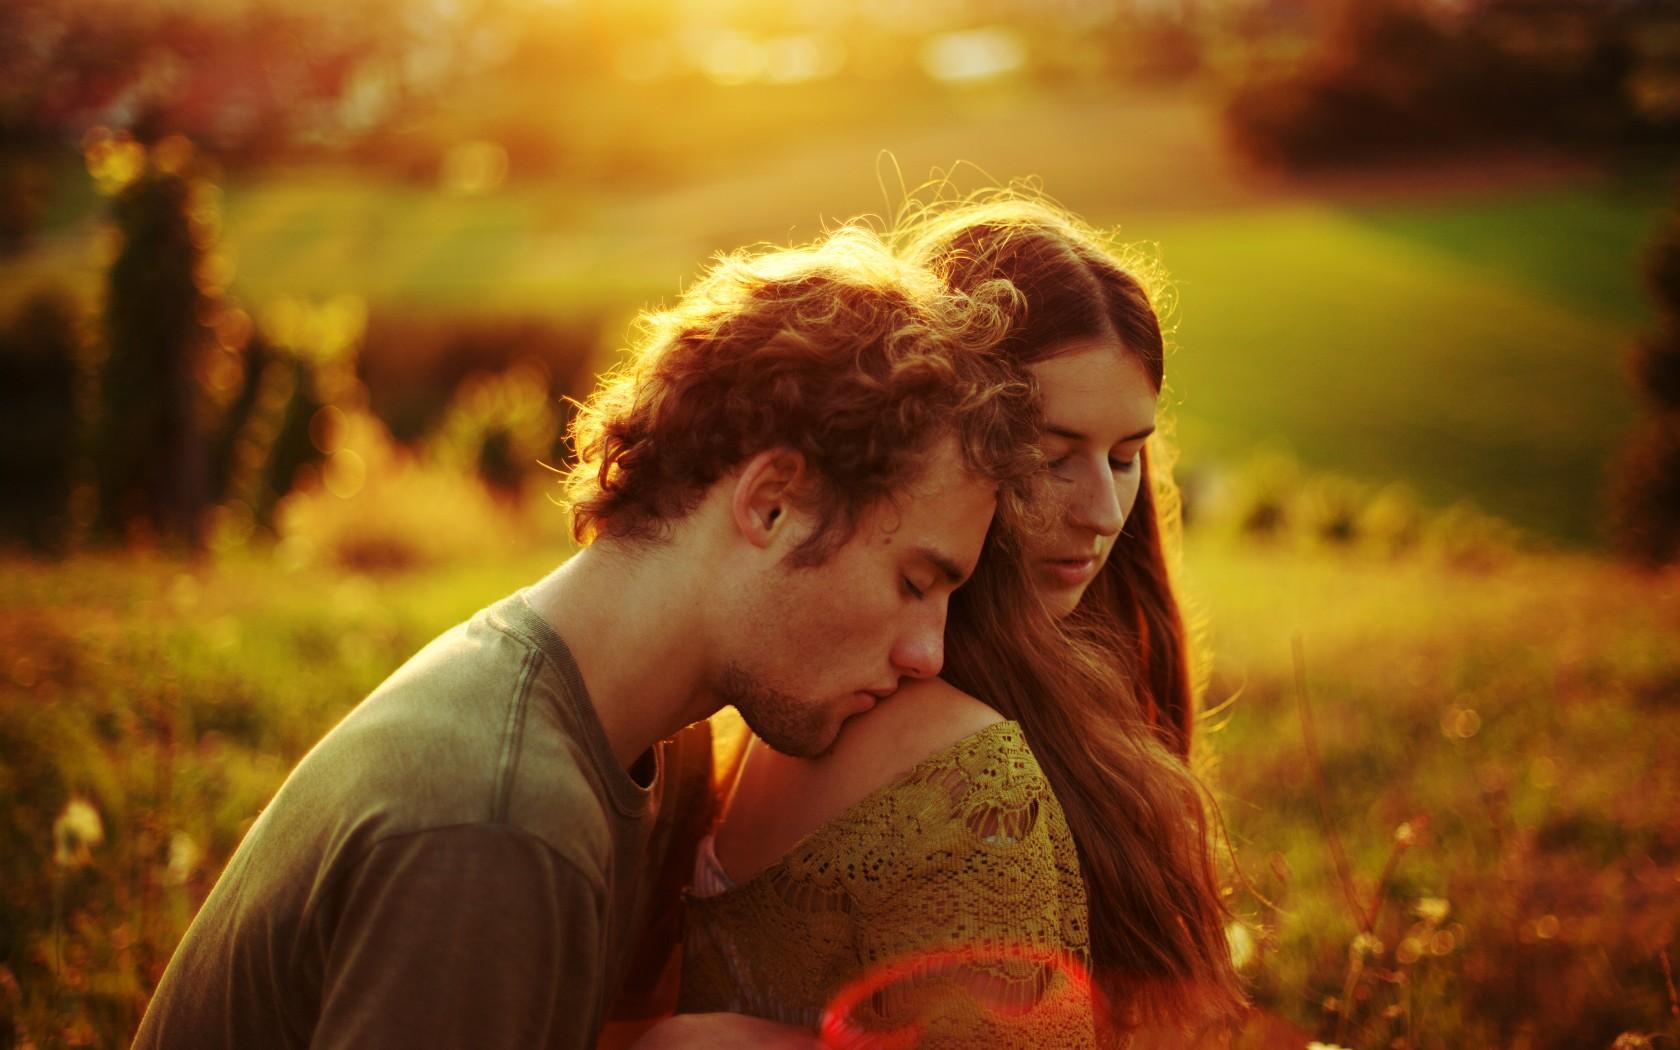 couple-love-shoulder-field-sunshine-photography-orange-happiness